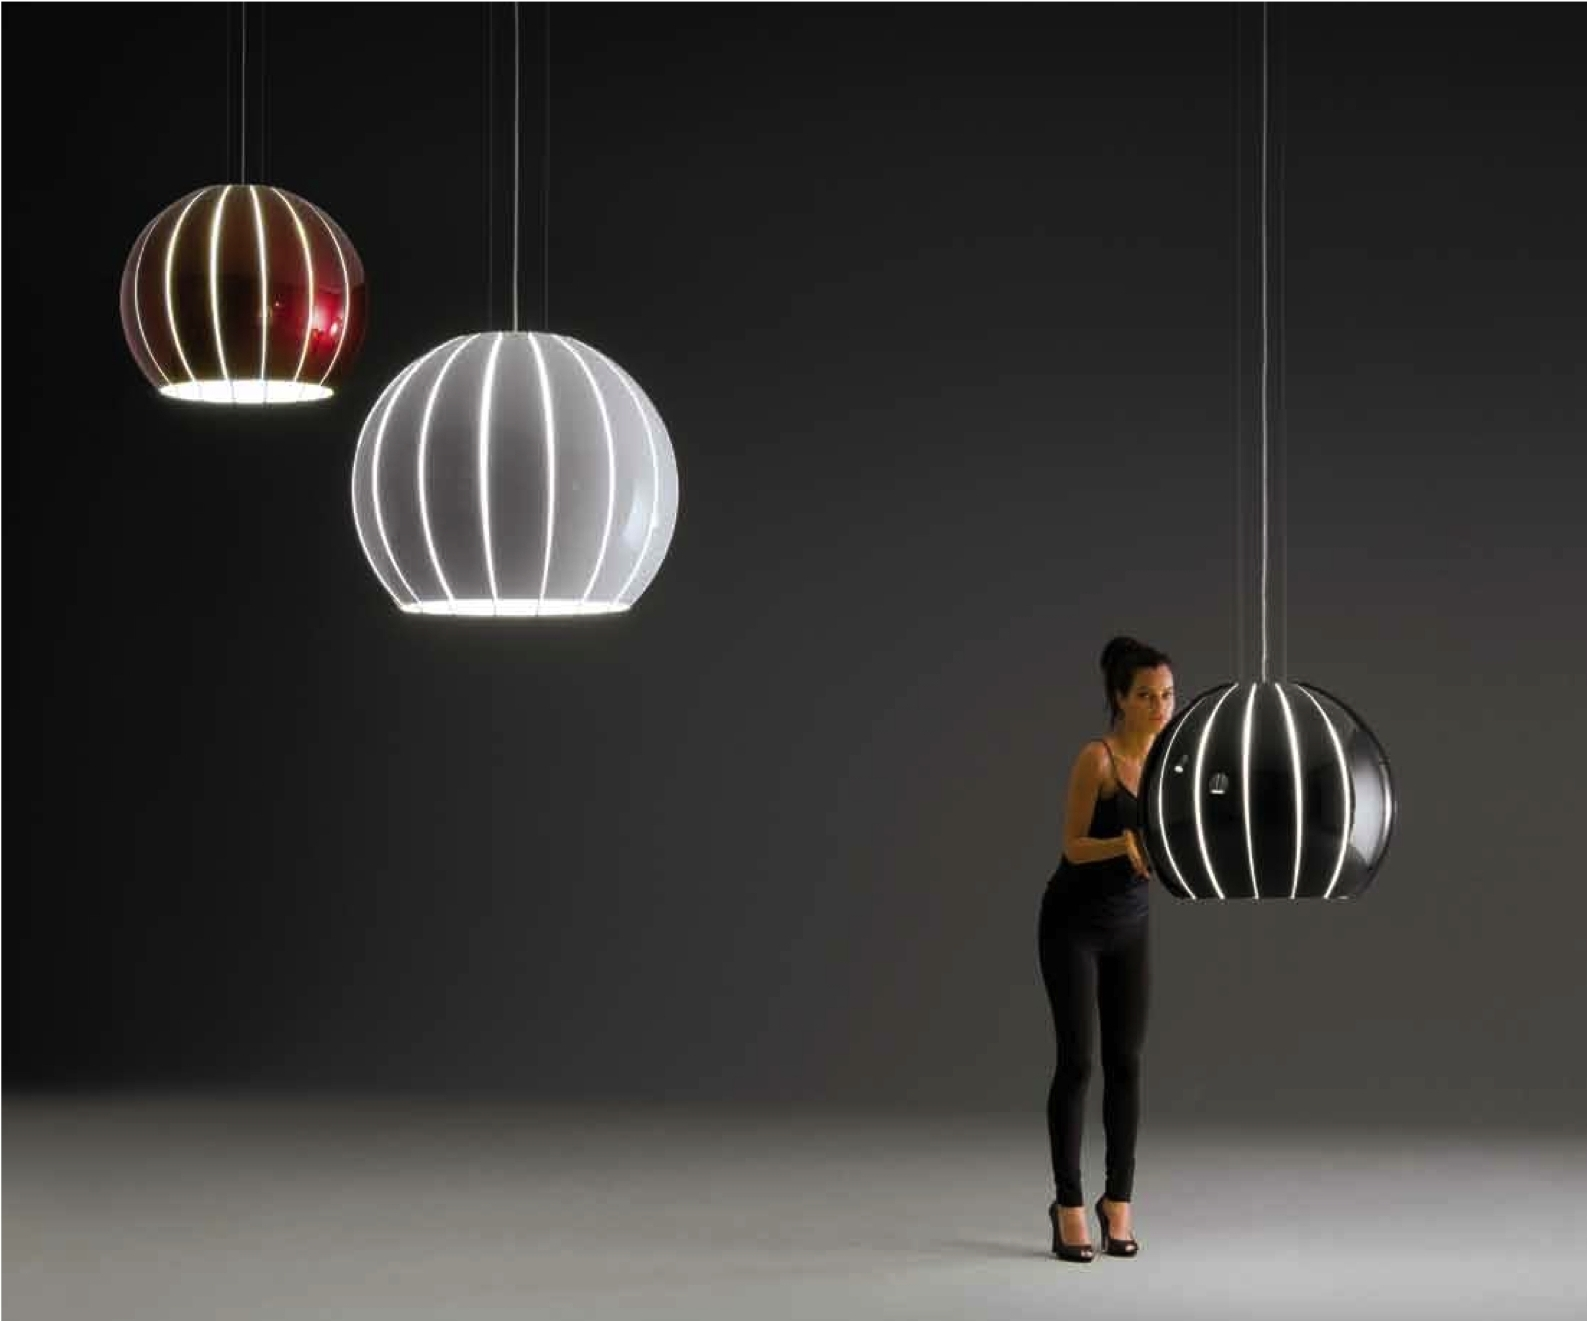 Most Recent Decor: Modern Home Lighting Fixture Ideas With Modern Pendant With Regard To Modern Pendant Lighting Fixtures (View 15 of 20)